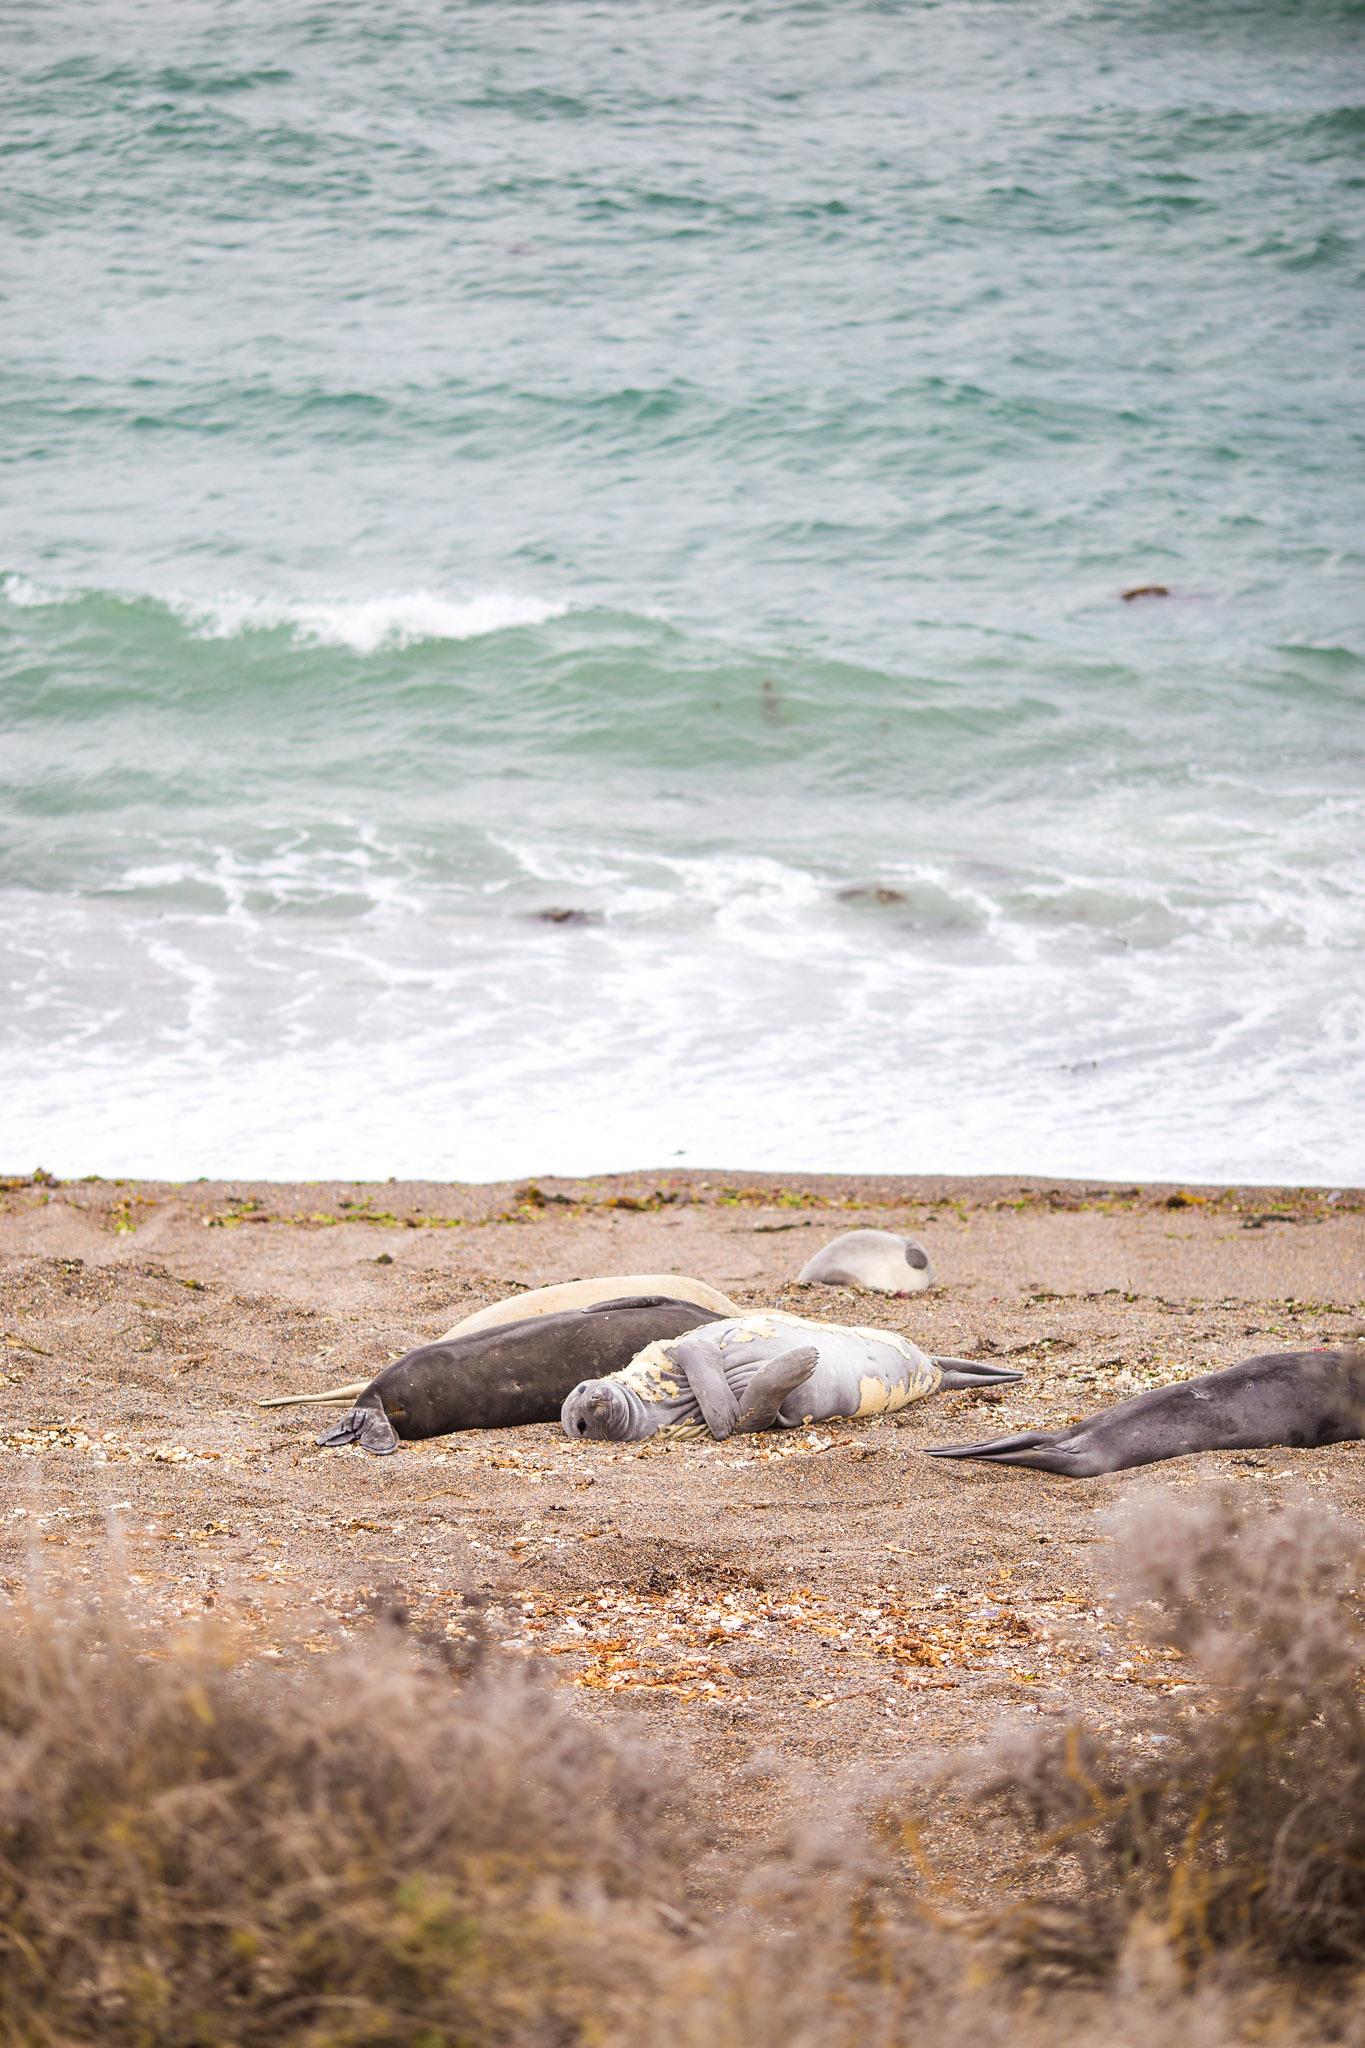 wedding-travellers-argentina-peninsula-valdes-elephant-seal-shore-coast-beach